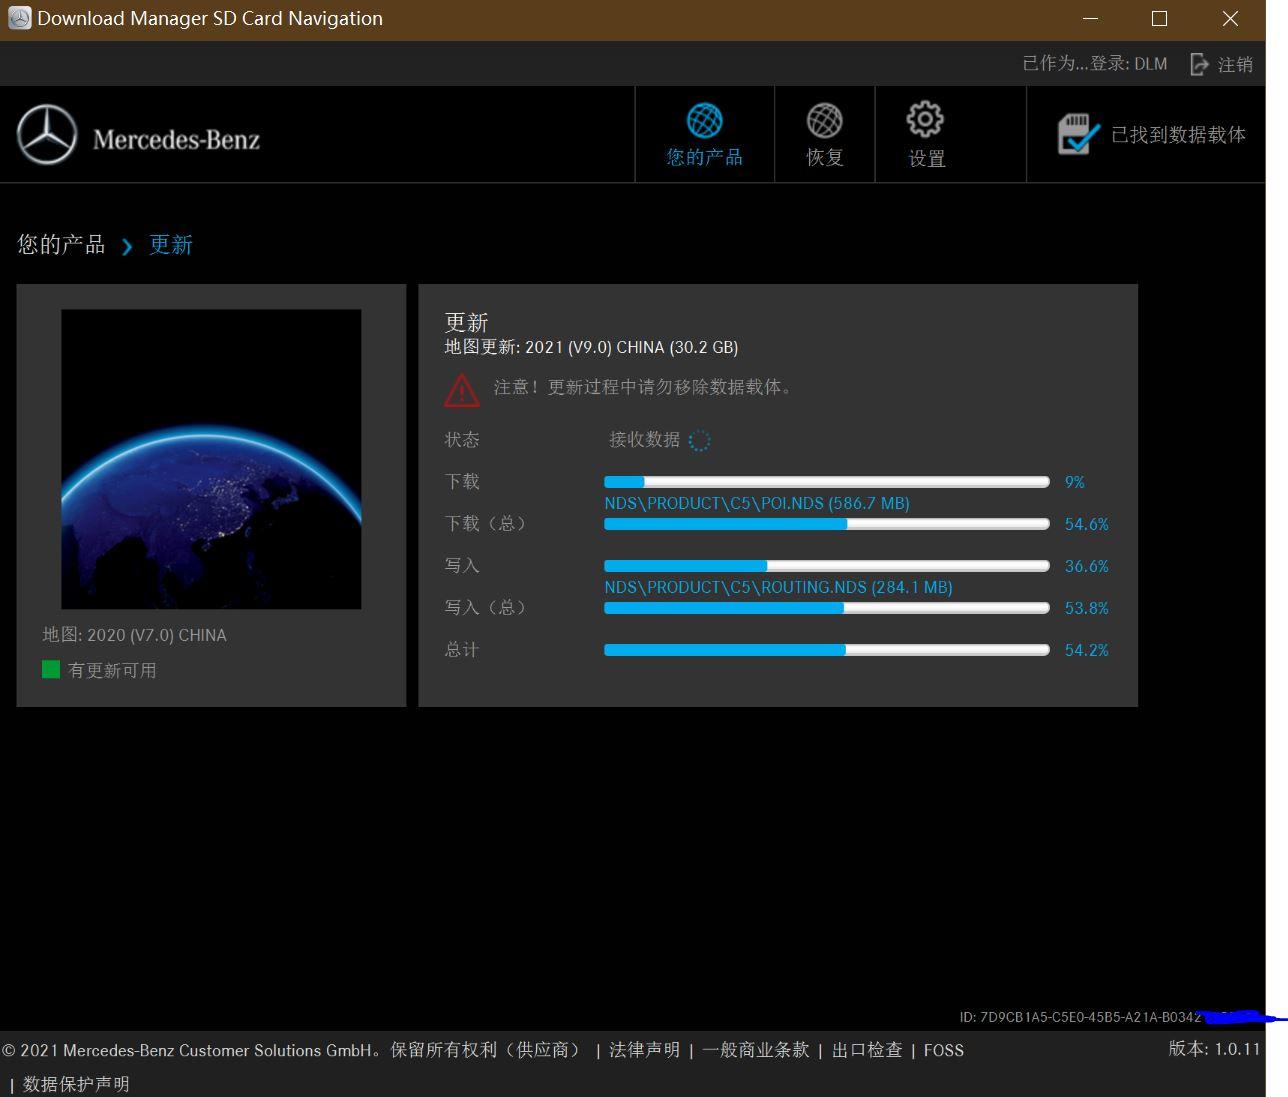 benz_download_manager.JPG